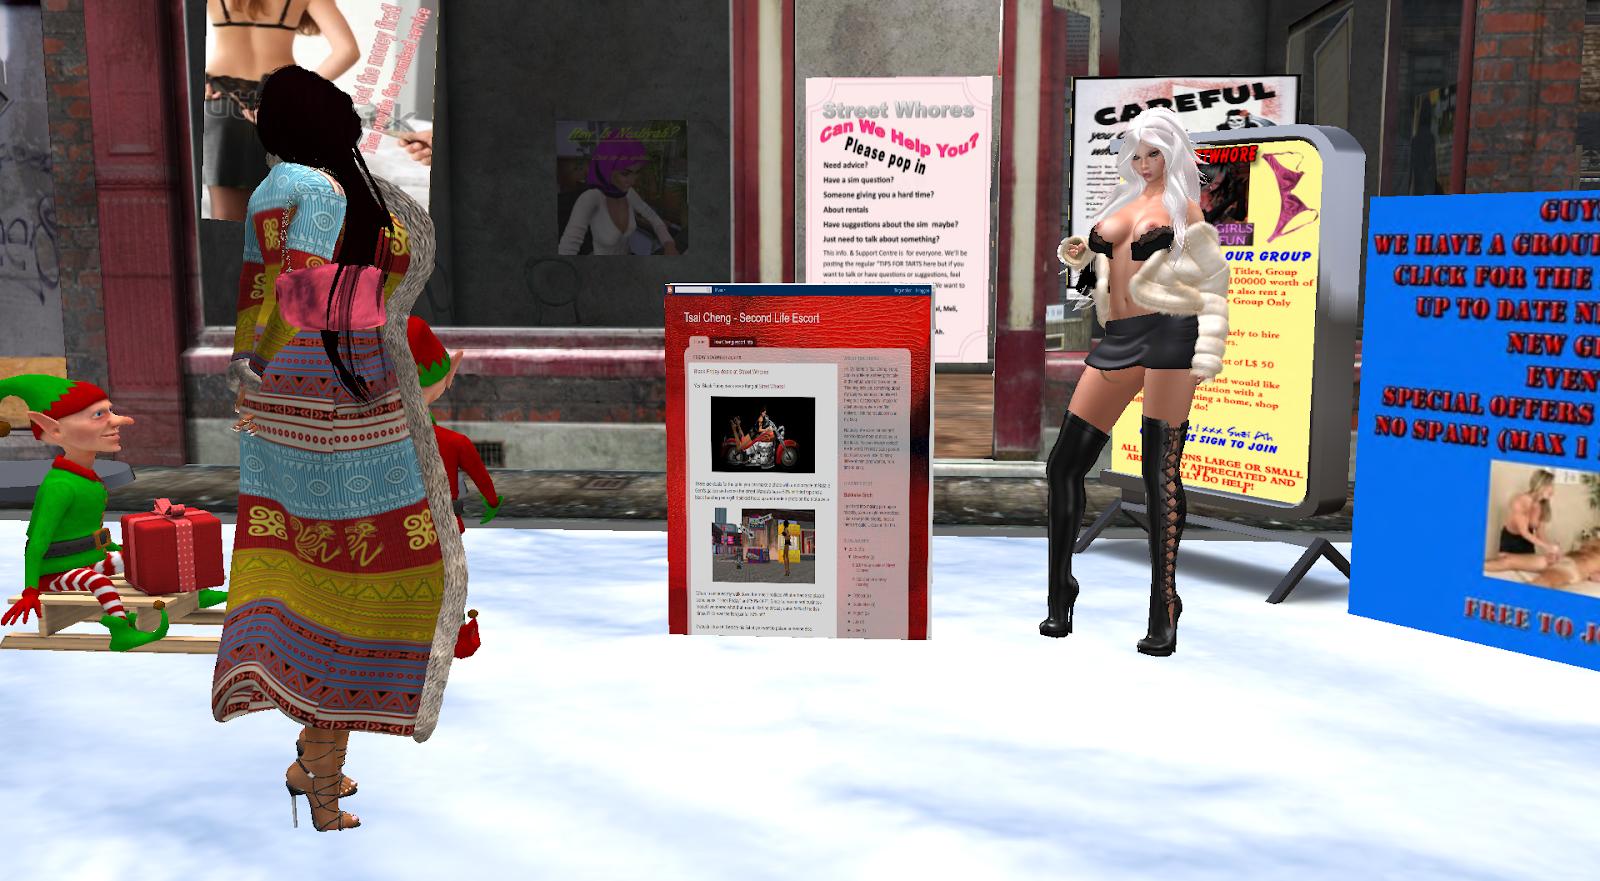 Tsai Cheng - Second Life Escort